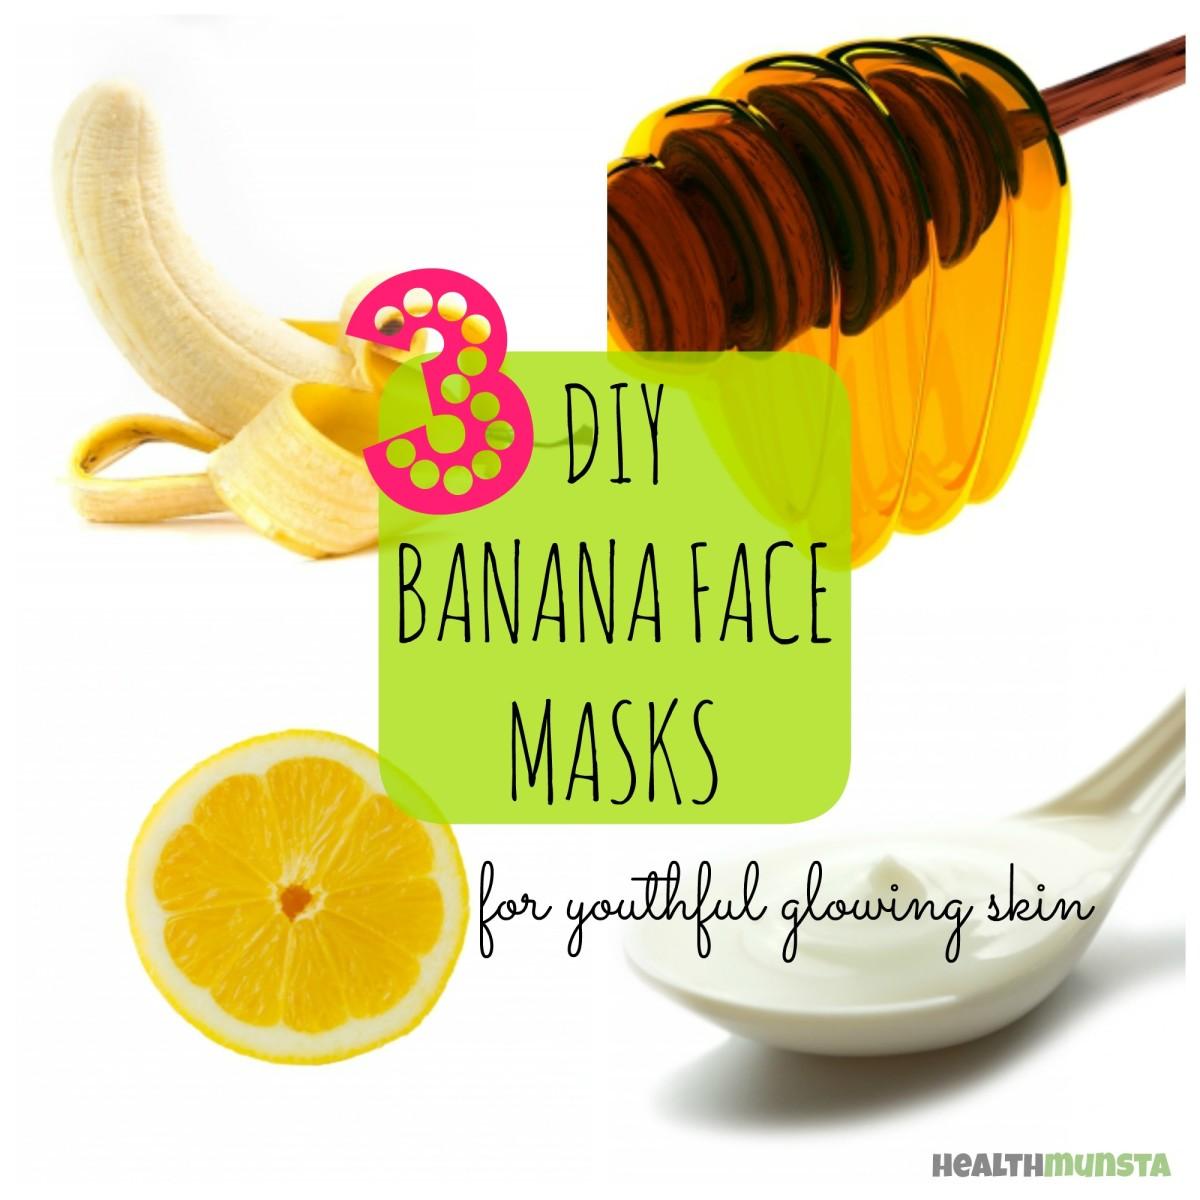 3 Diy Banana Face Mask Recipes For Radiant Skin Bellatory Fashion And Beauty